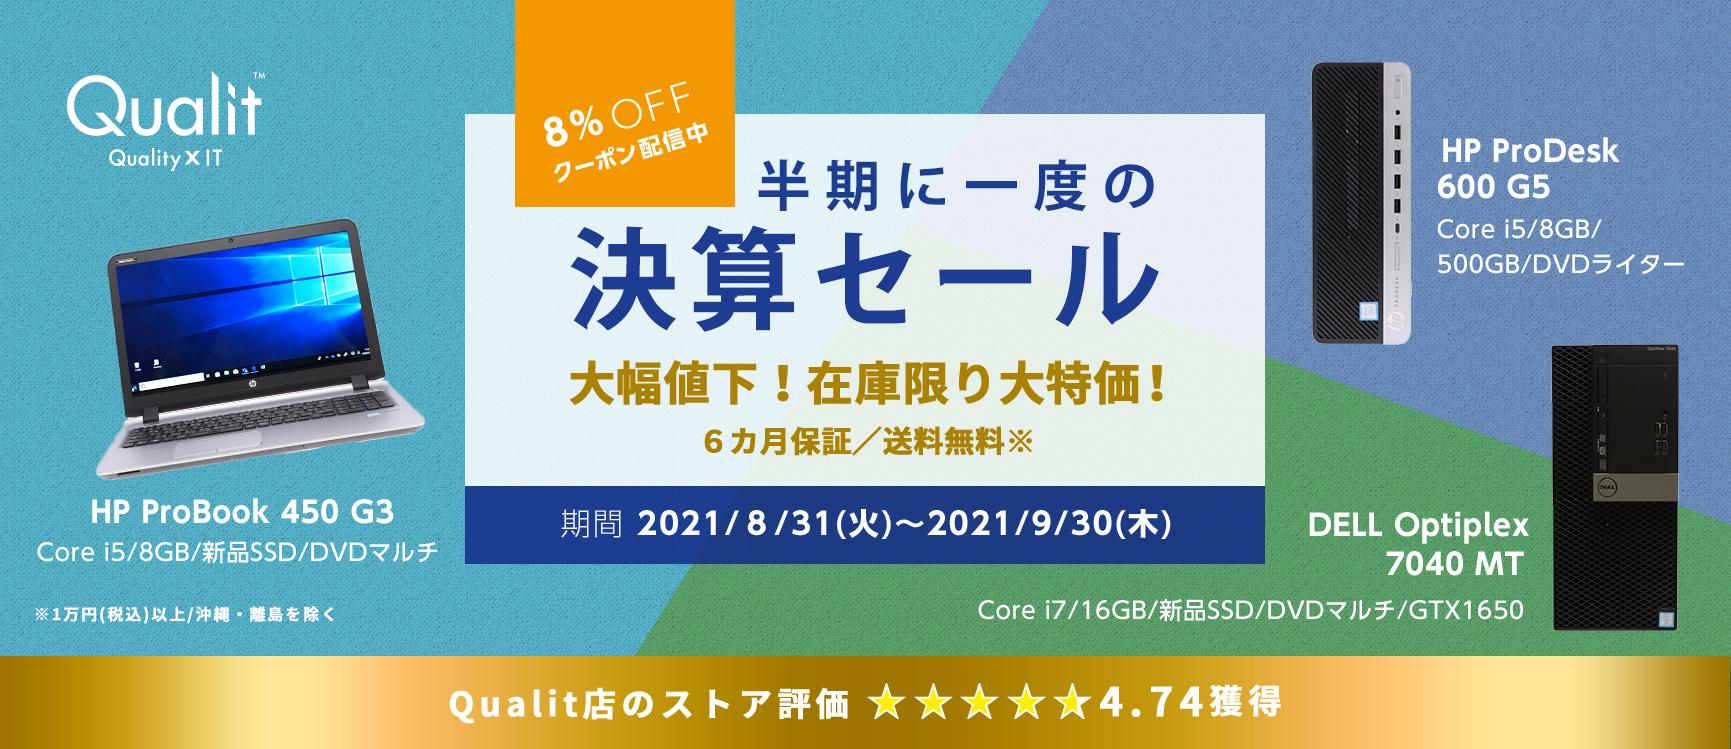 Qualit クオリット 9月 半期に一度の決算セール 大幅値下!在庫限り大特価! 6カ月保証/送料無料※ 2021/8/31(火)~2021/9/30(木) Qualit店のストア評価★4.74獲得